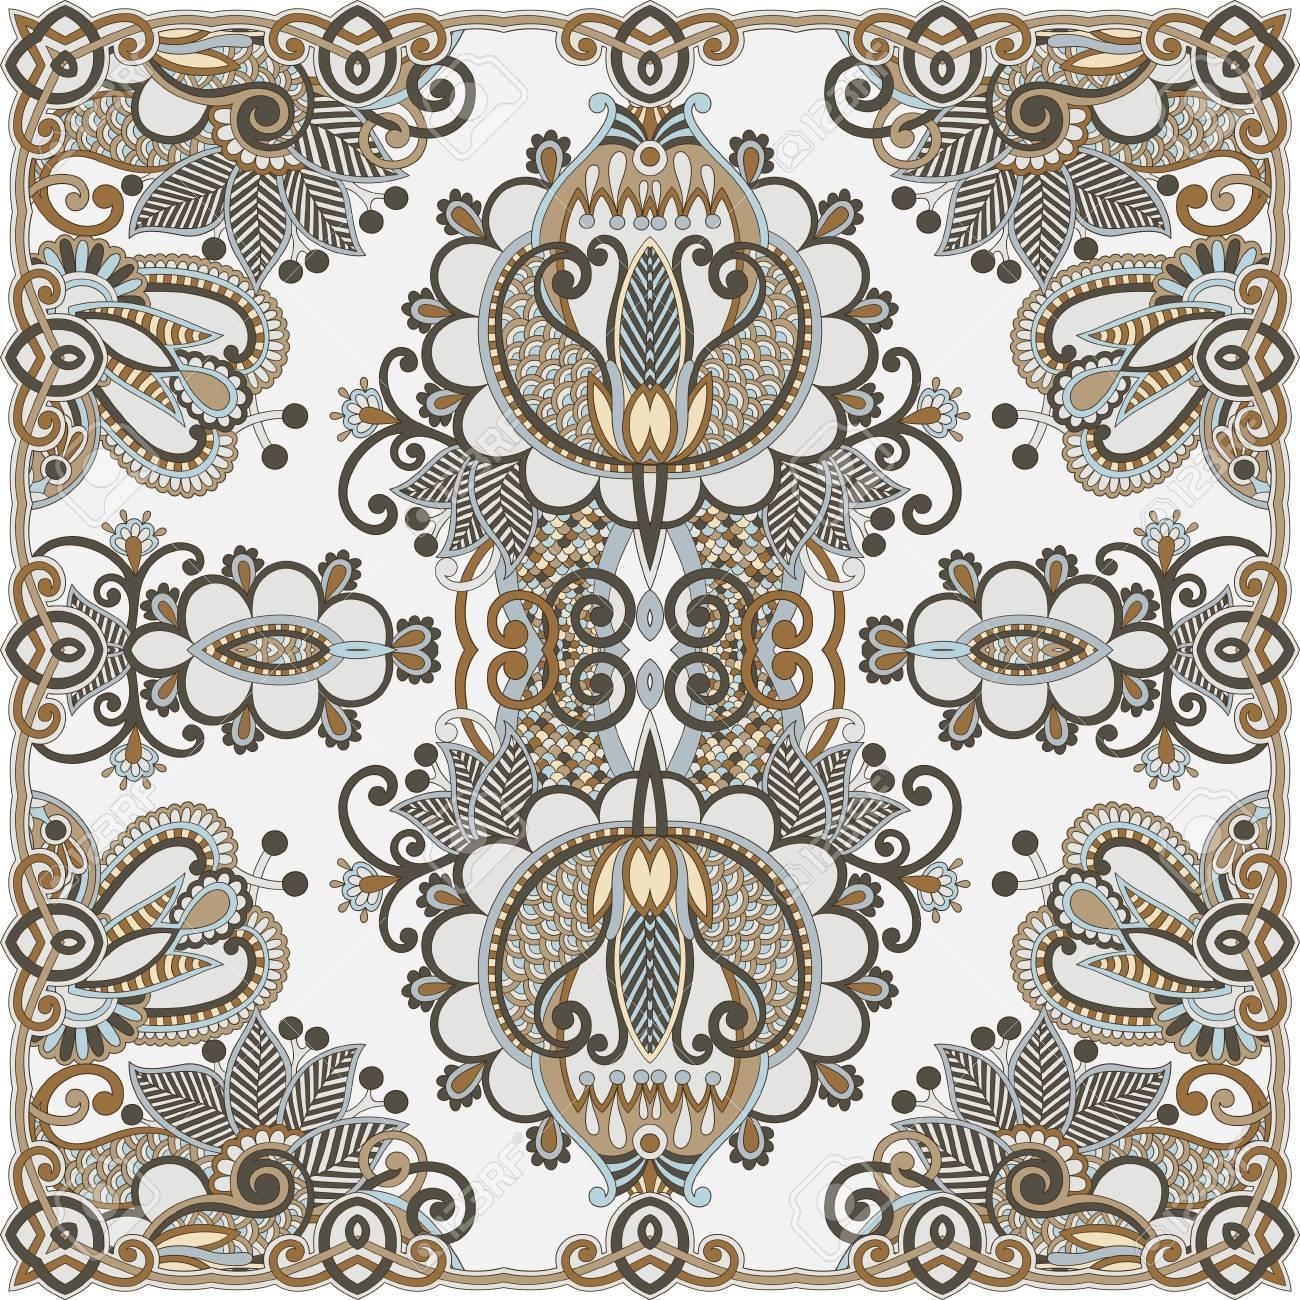 Traditional Ornamental Floral Paisley Bandana Stock Vector - 13440306